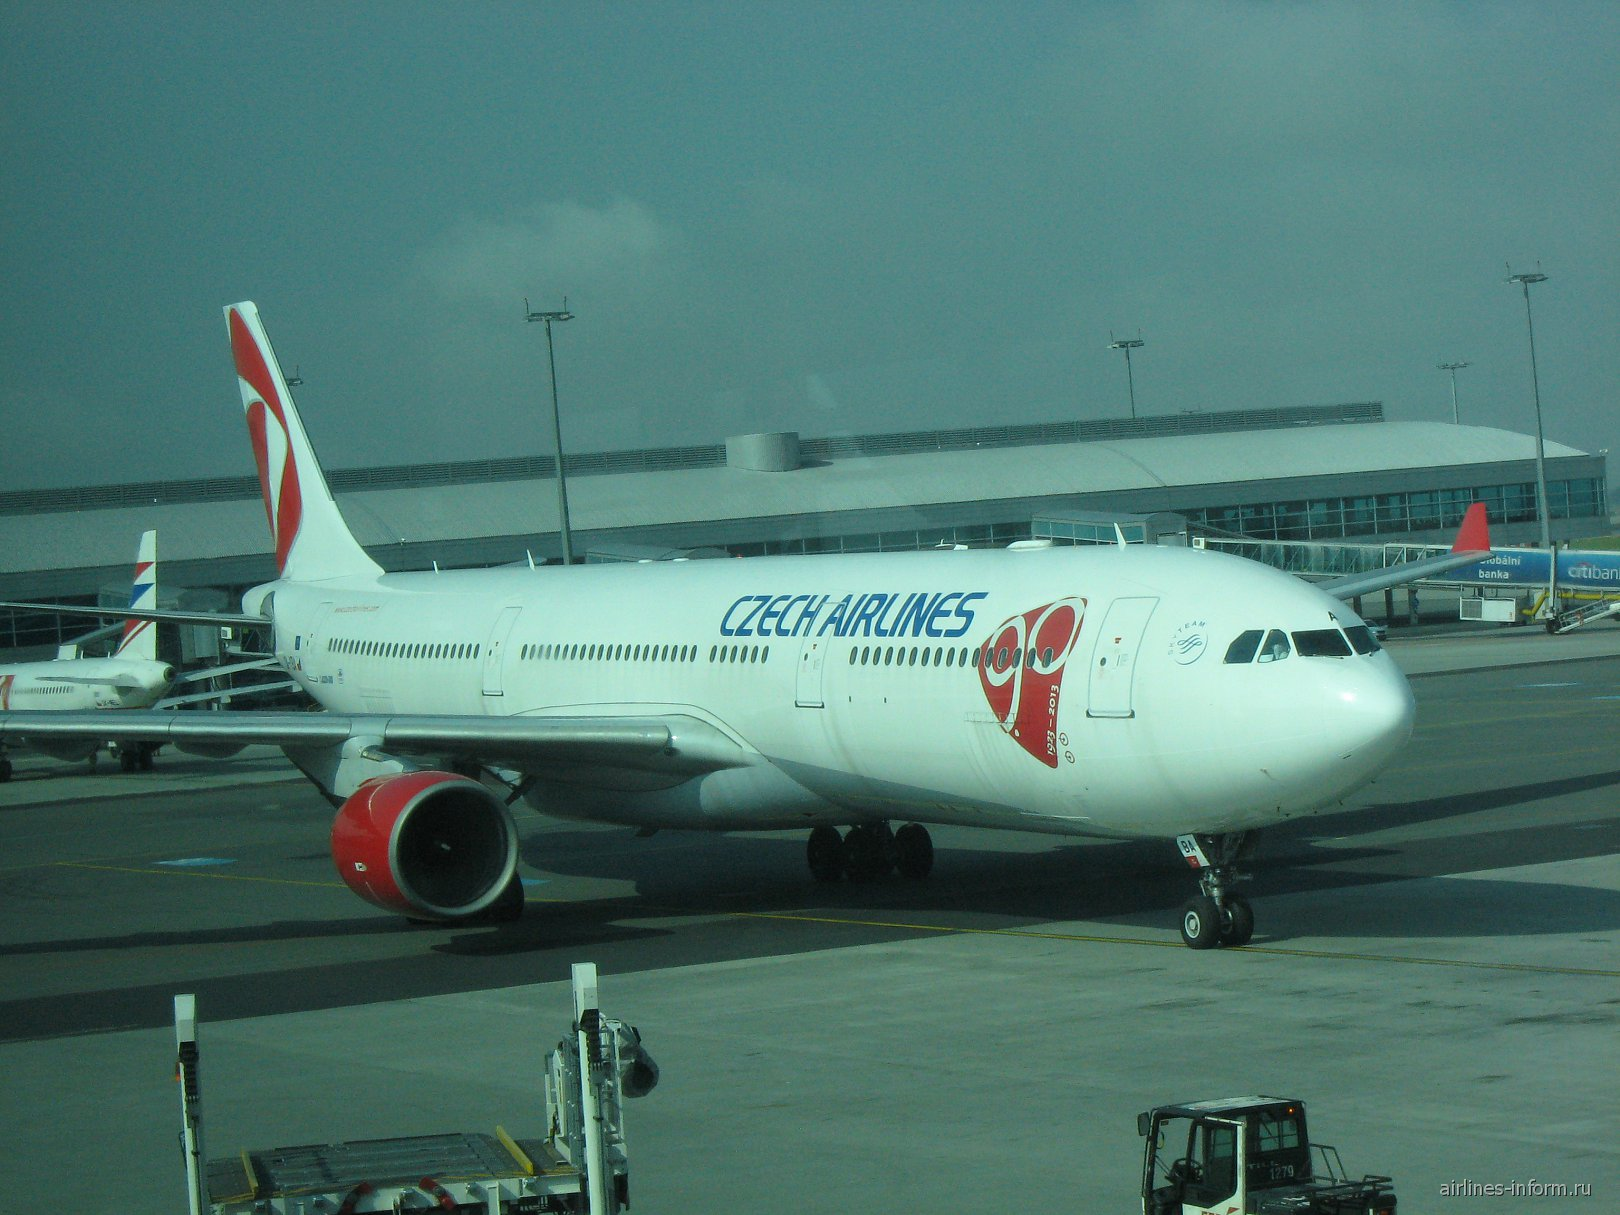 Airbus A330 Чешских авиалиний в аэропорту Праги